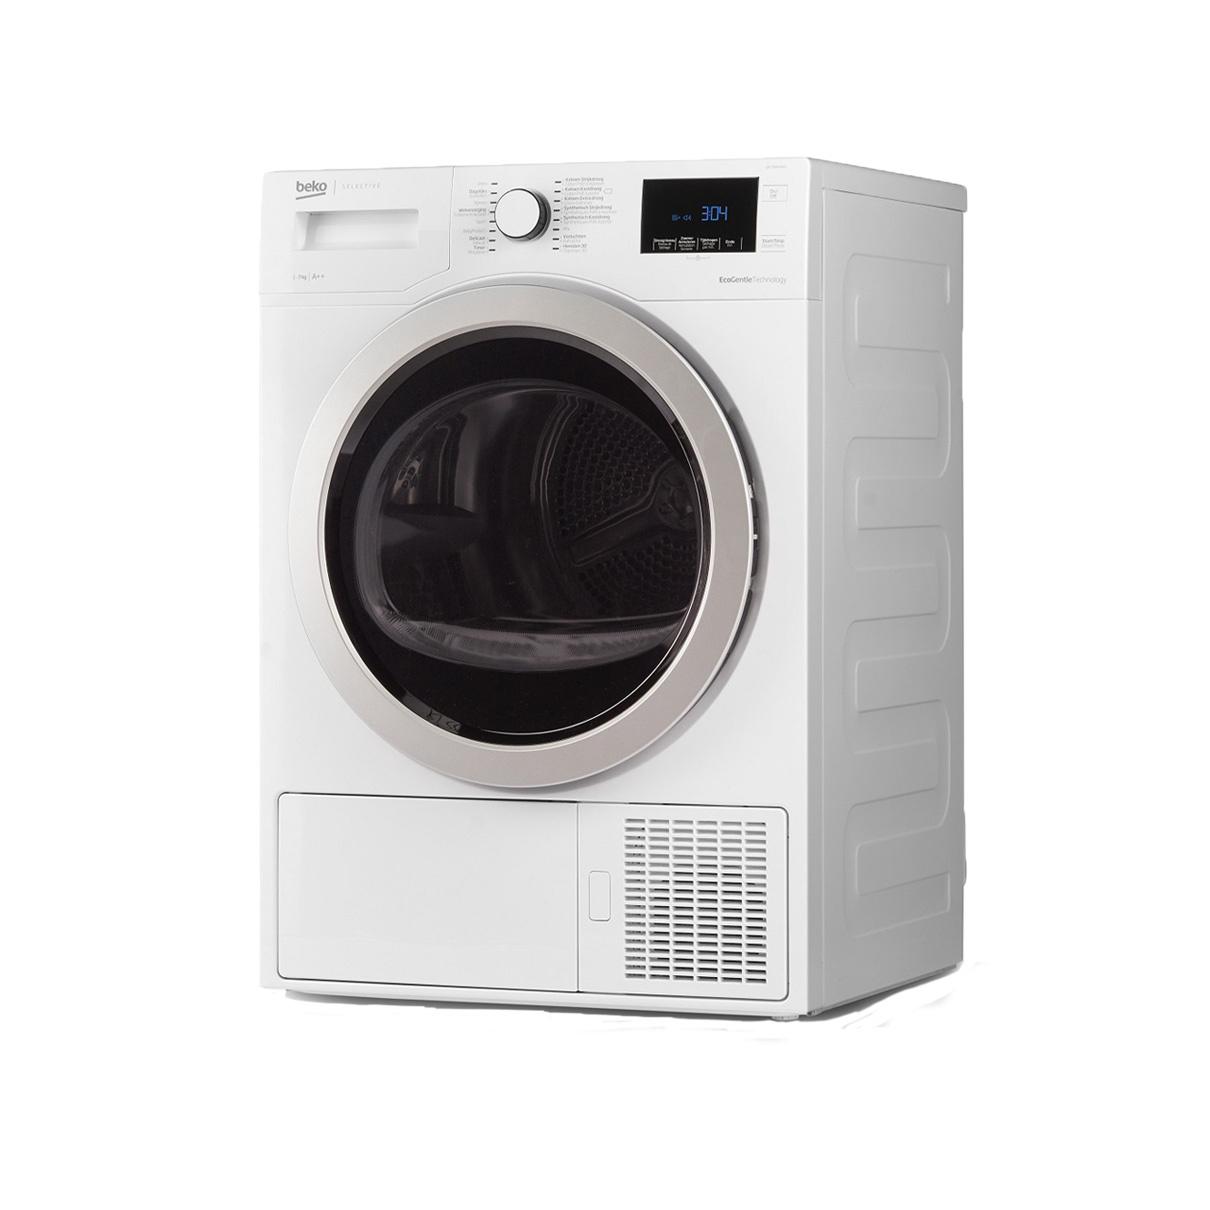 Warmtepomp wasdrogers